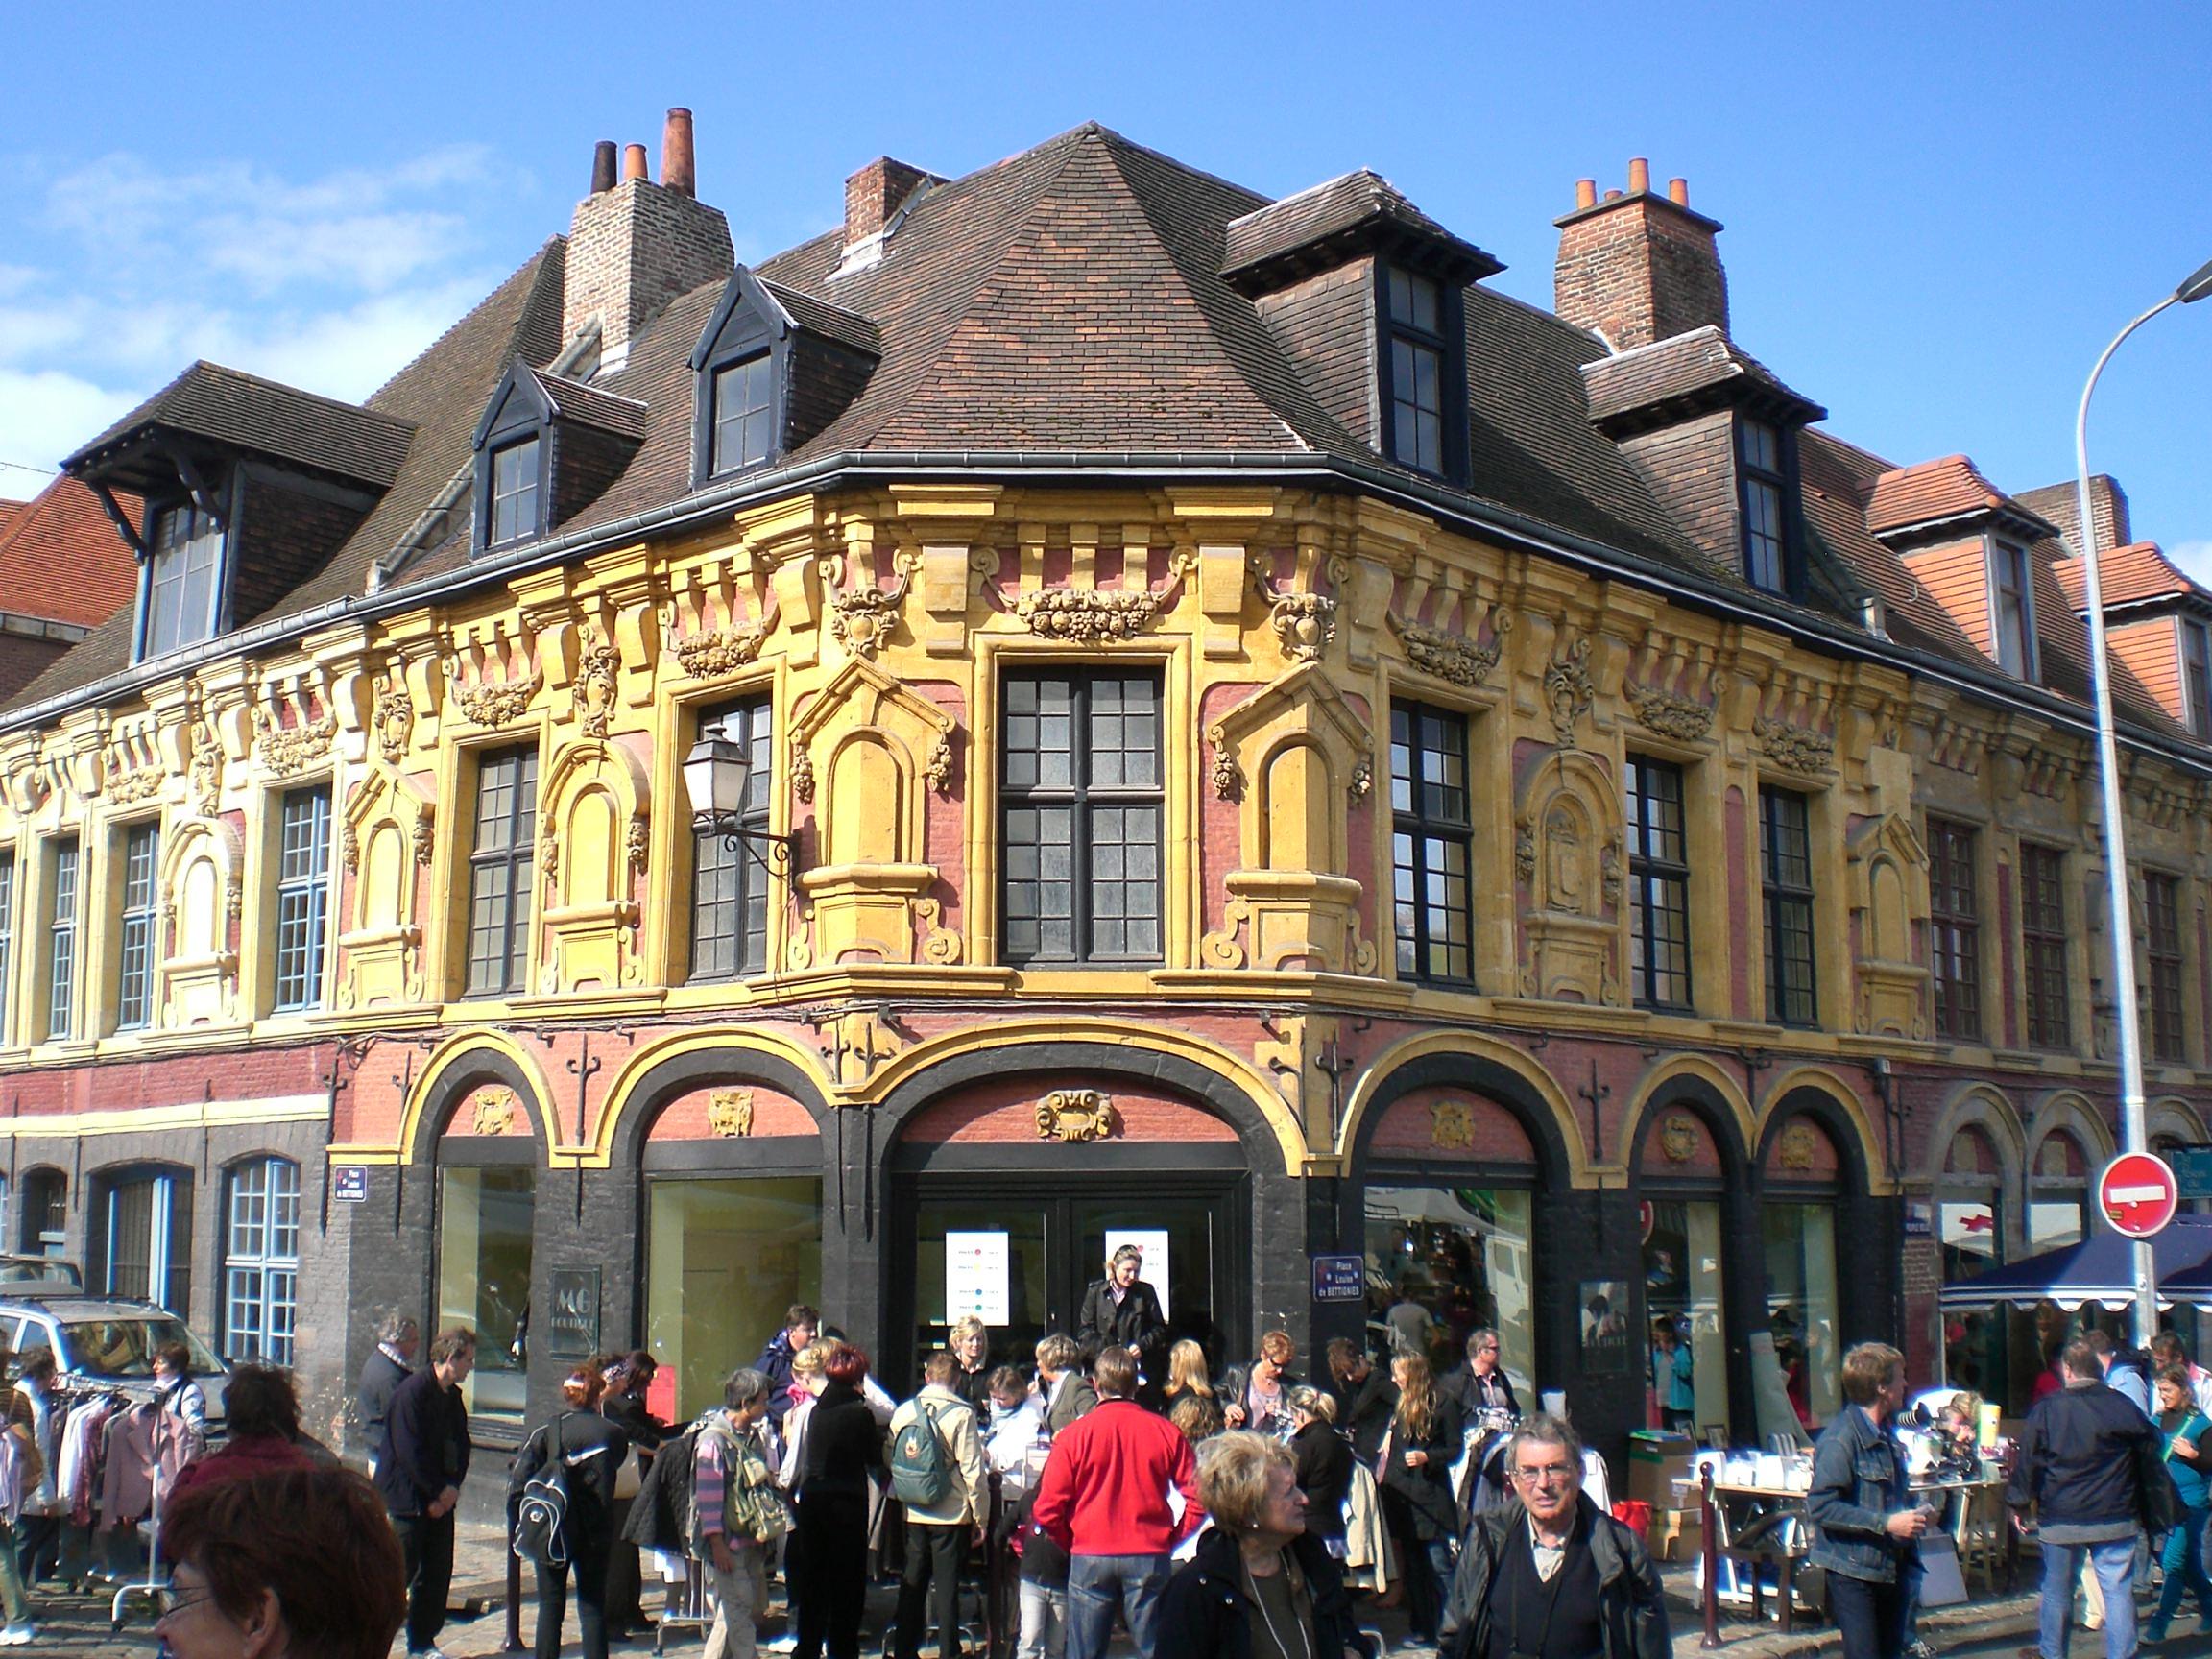 Maison Gilles file:maison gilles boe lille - wikimedia commons